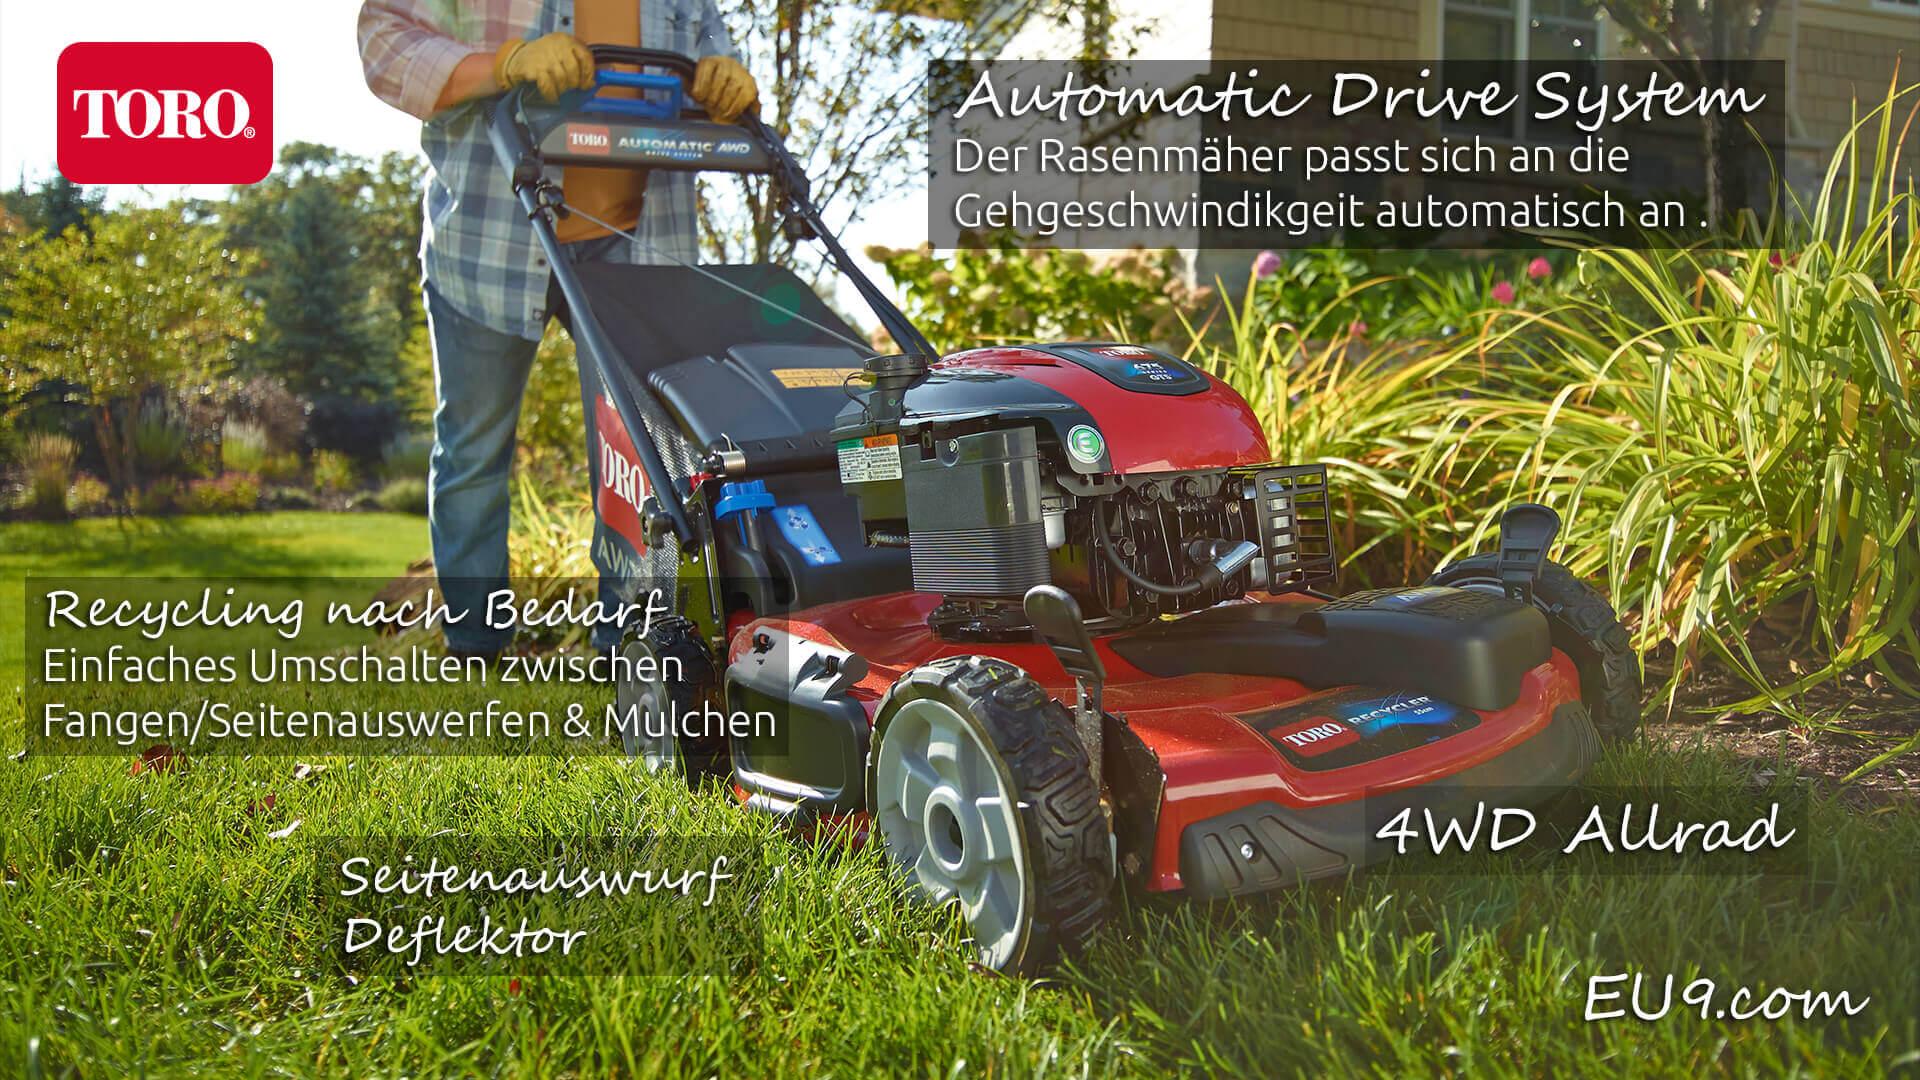 toro 20960 allrad automatic drive benzin-rasenmäher - eu9